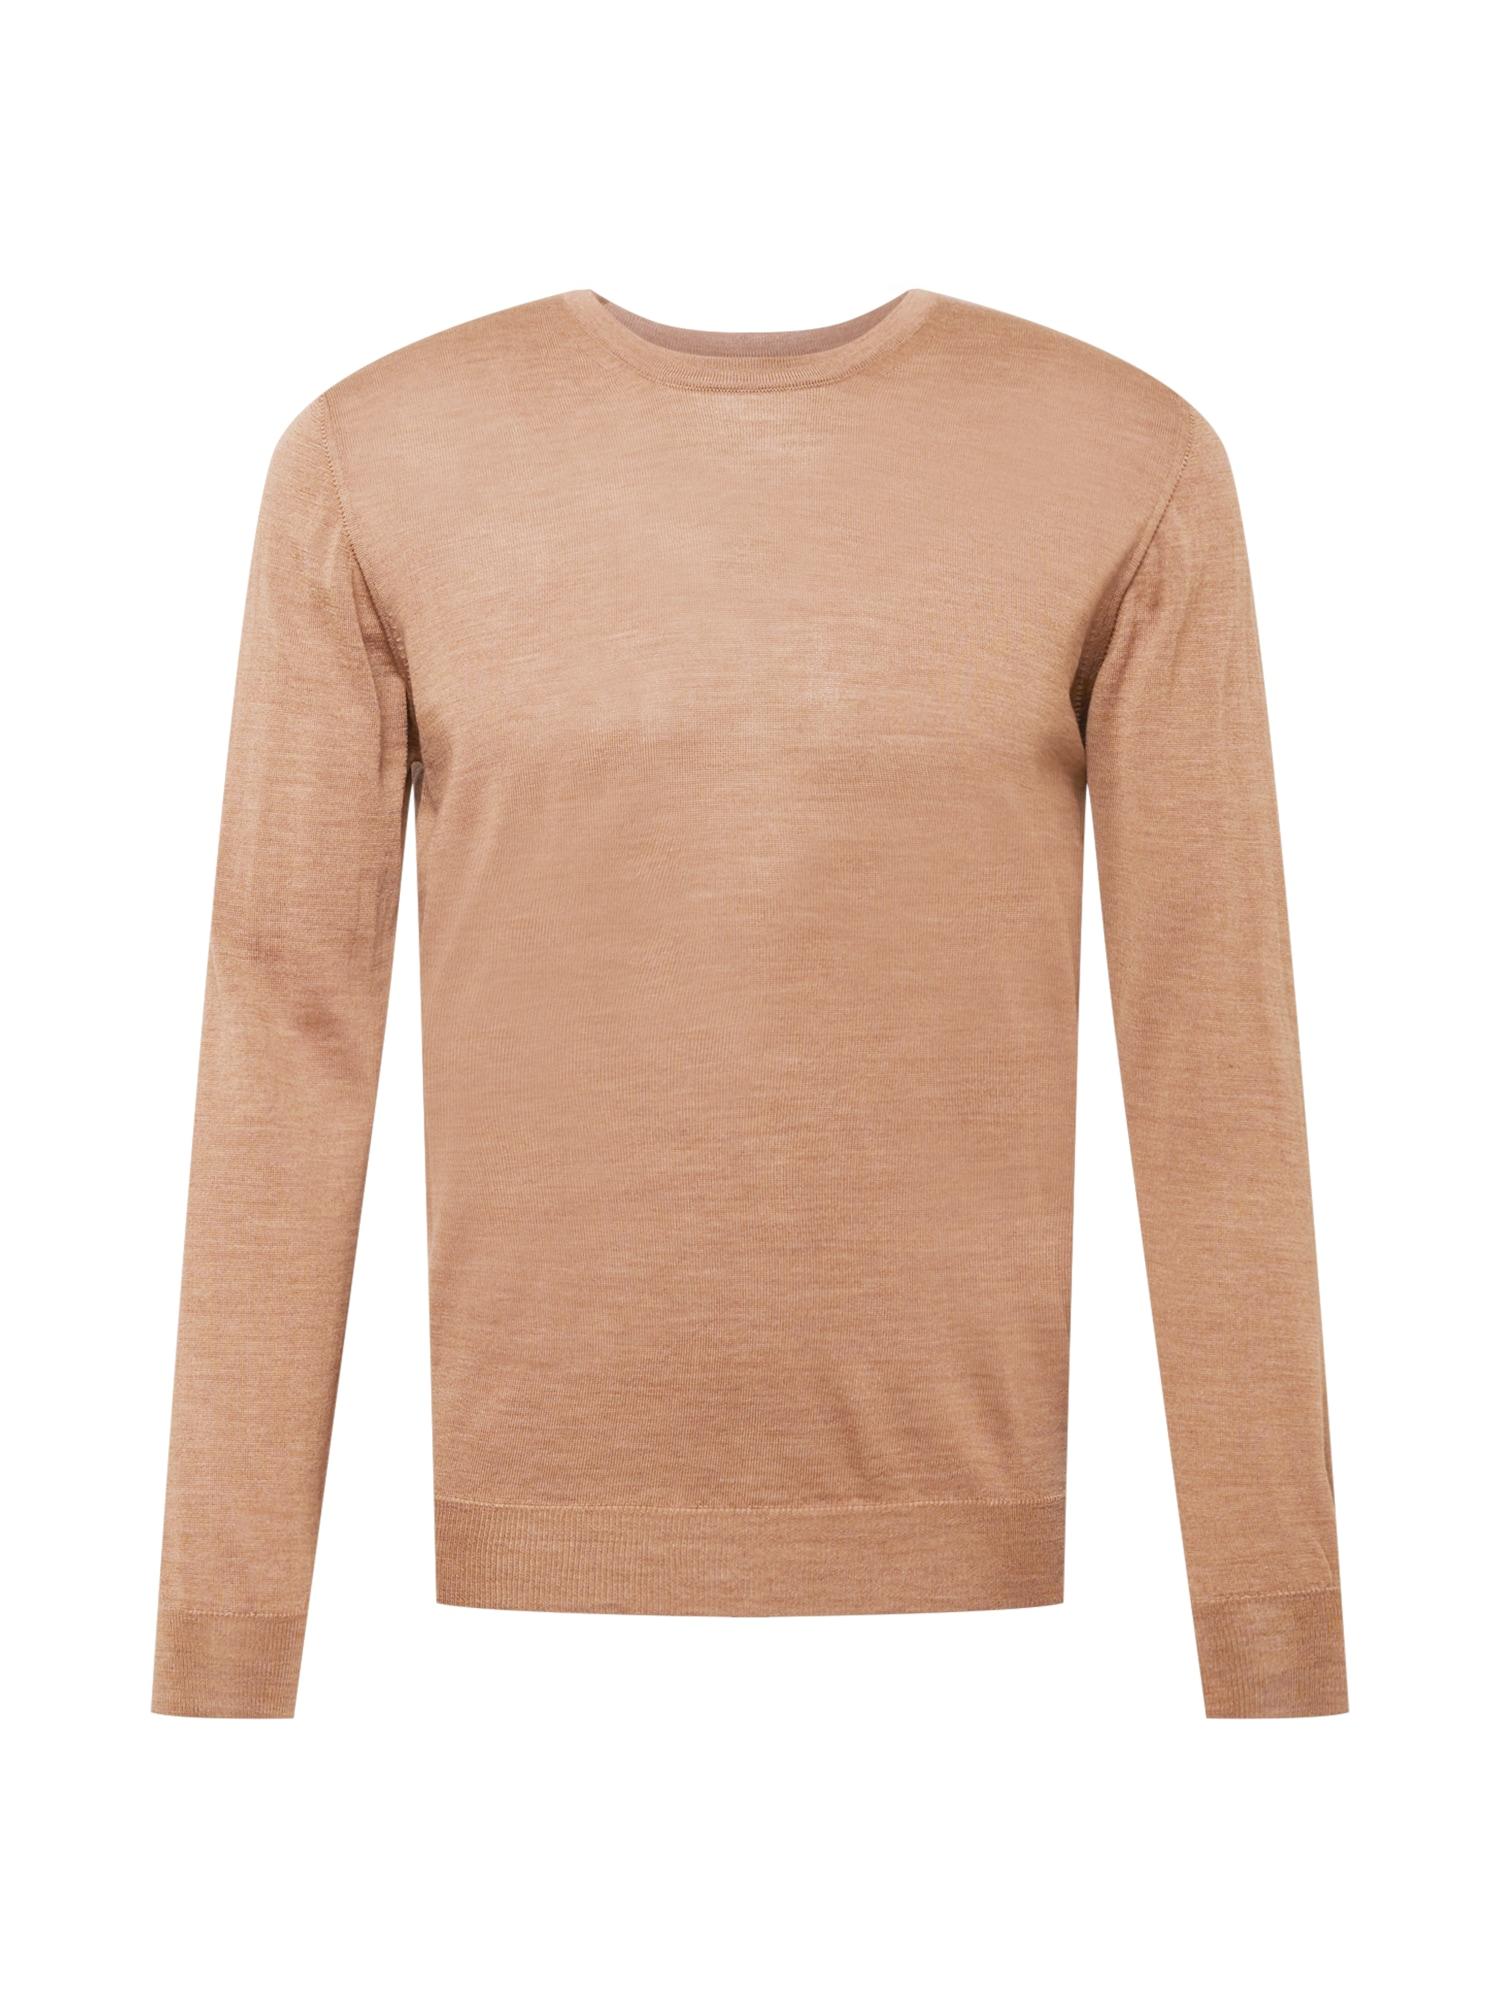 SAND COPENHAGEN Megztinis gelsvai pilka spalva